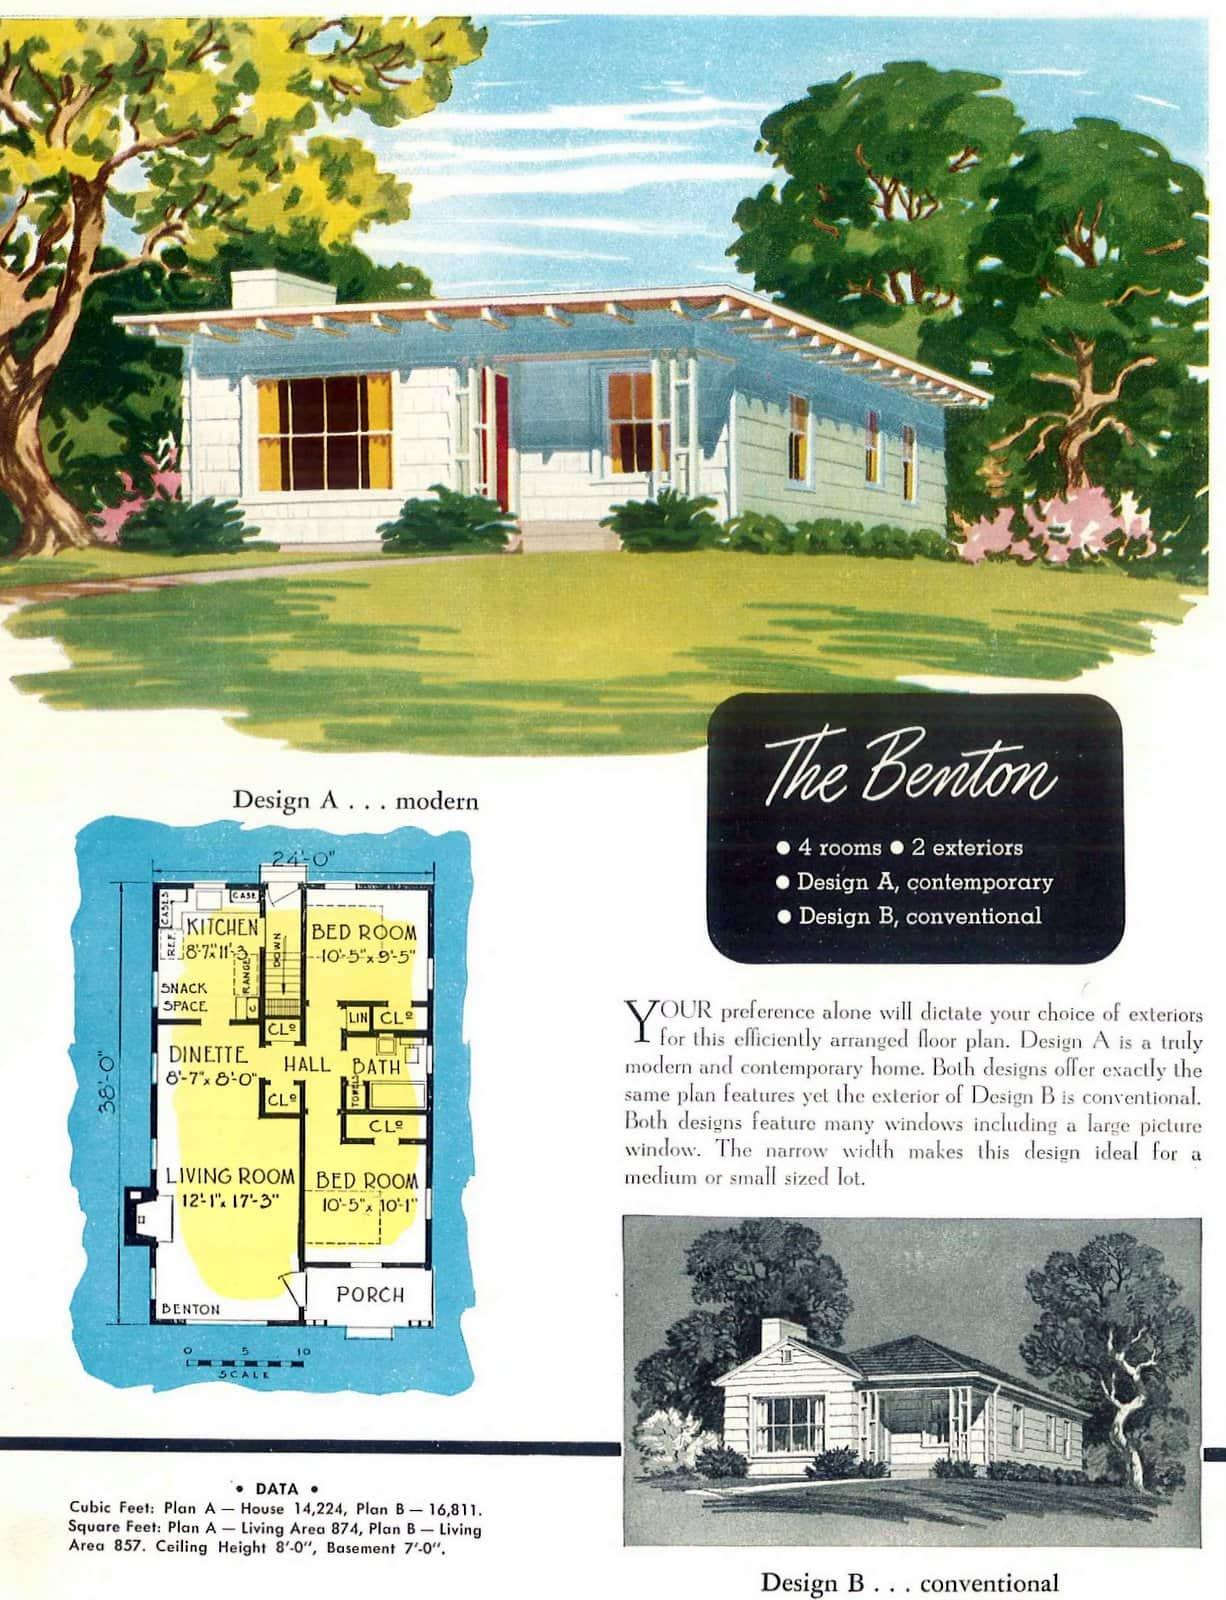 Vintage 40s post-war starter home designs from 1949 (6)